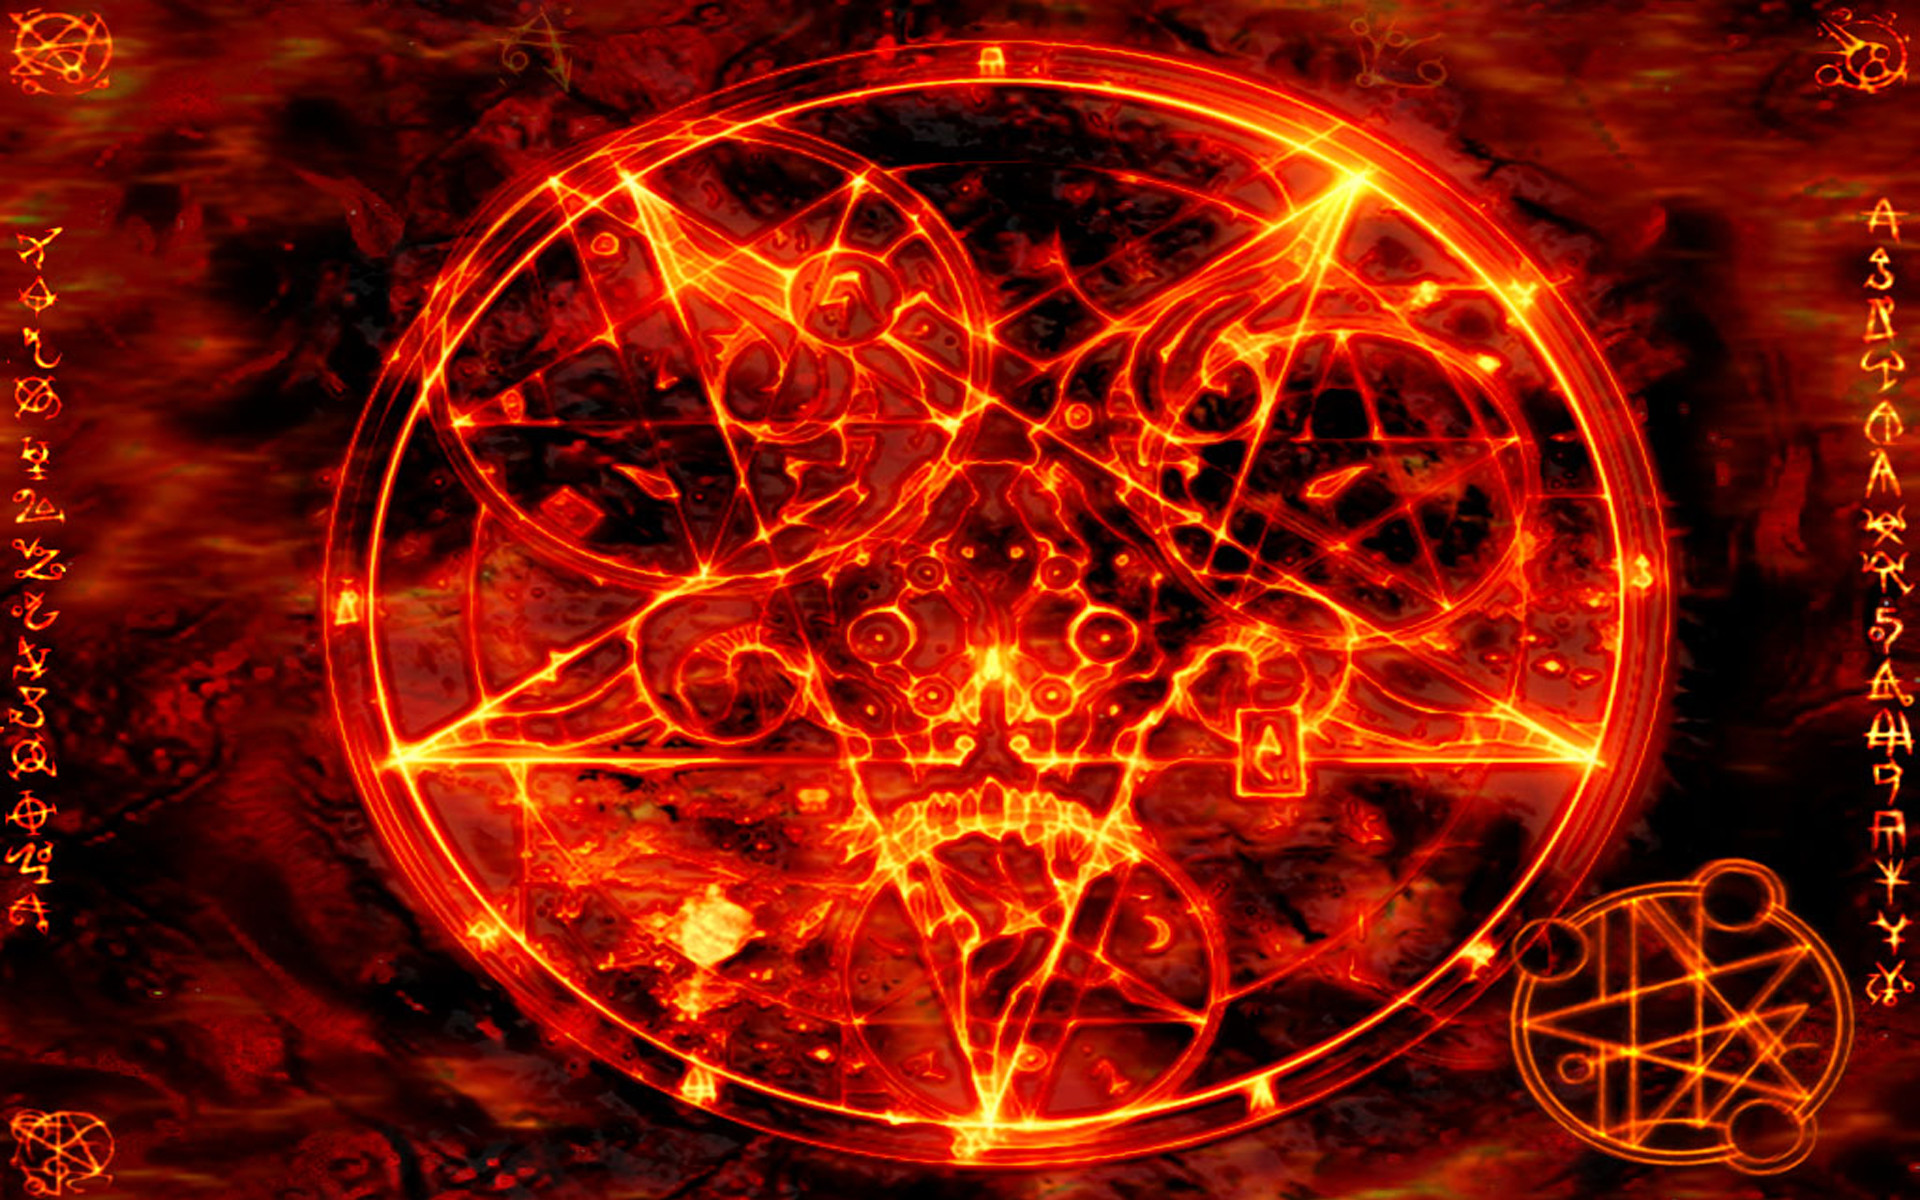 Image – Pentagram satanic hd-wallpaper-265539.jpg   Villains Wiki   FANDOM  powered by Wikia